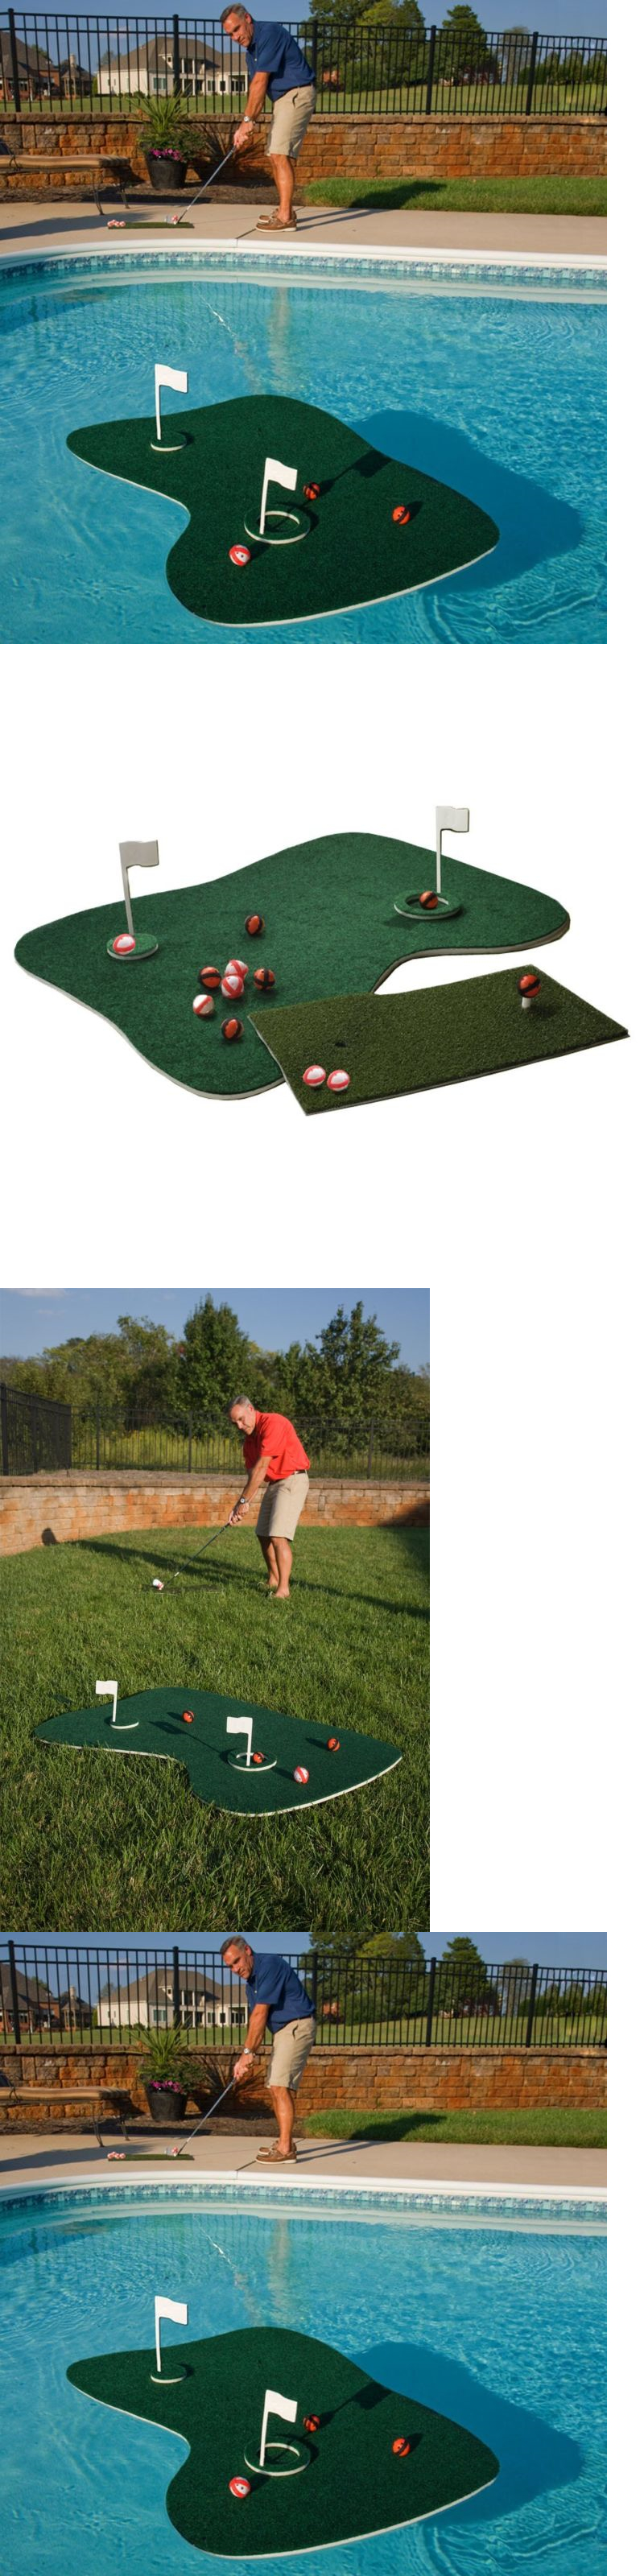 Putting Greens and Aids Genuine Aqua Golf Backyard Game